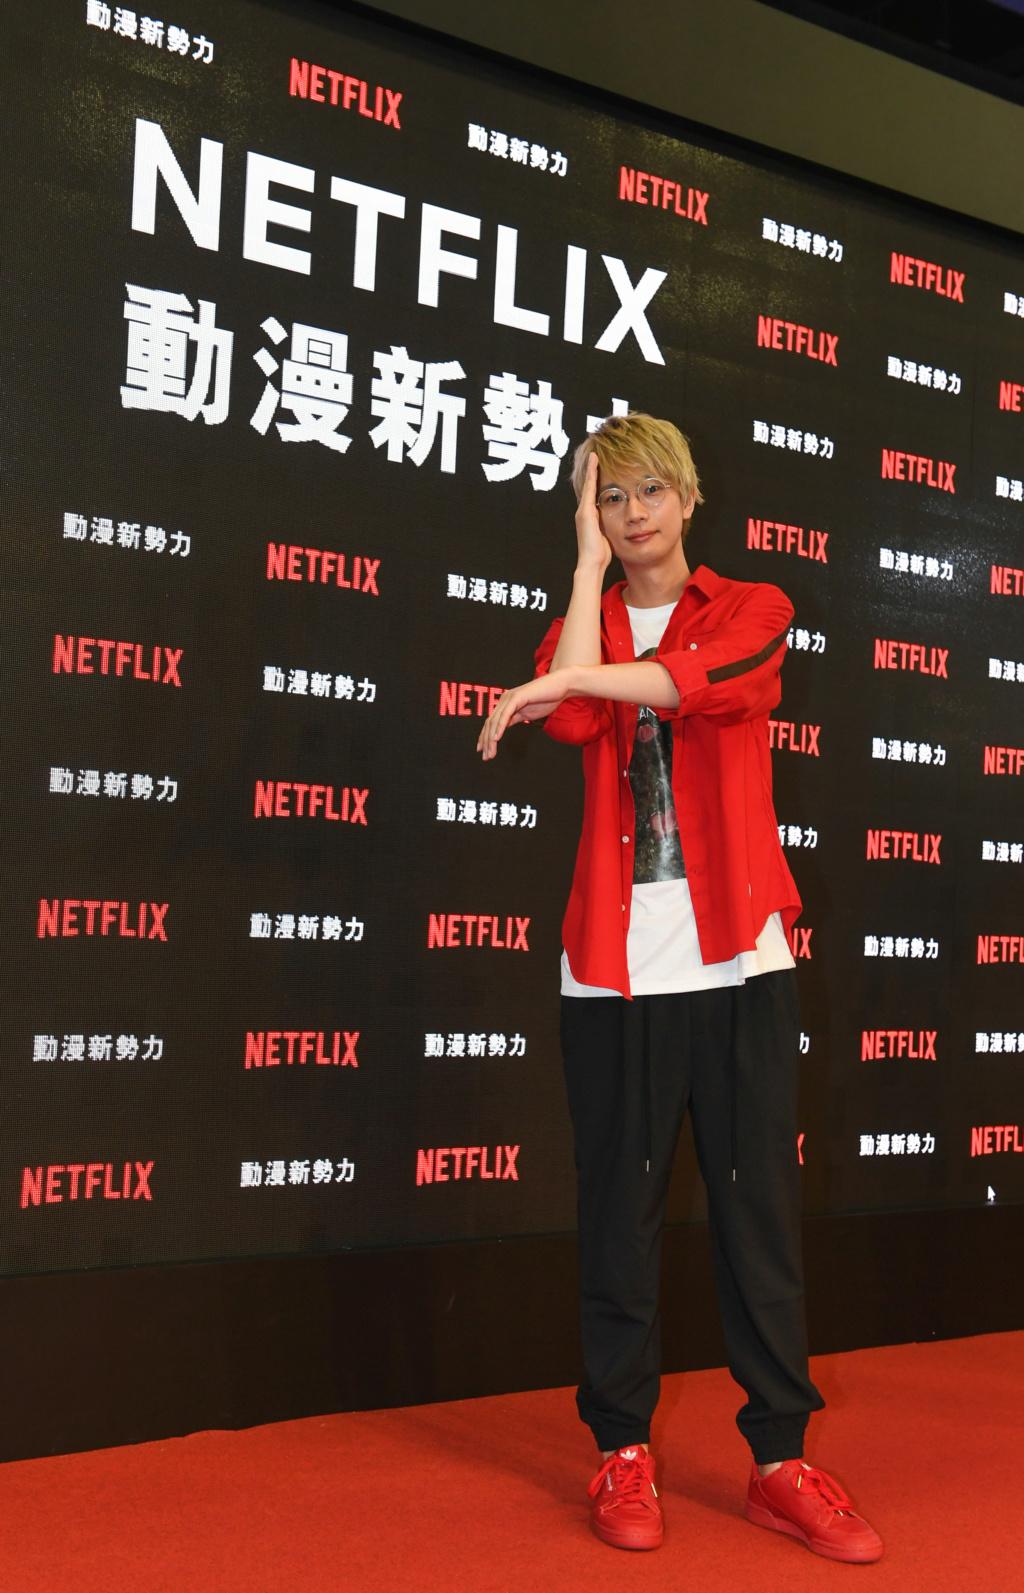 Netflix 台北漫畫博覽會初體驗大成功!星光陣容嗨翻全場粉絲引爆年度盛會最高潮 Taipei27